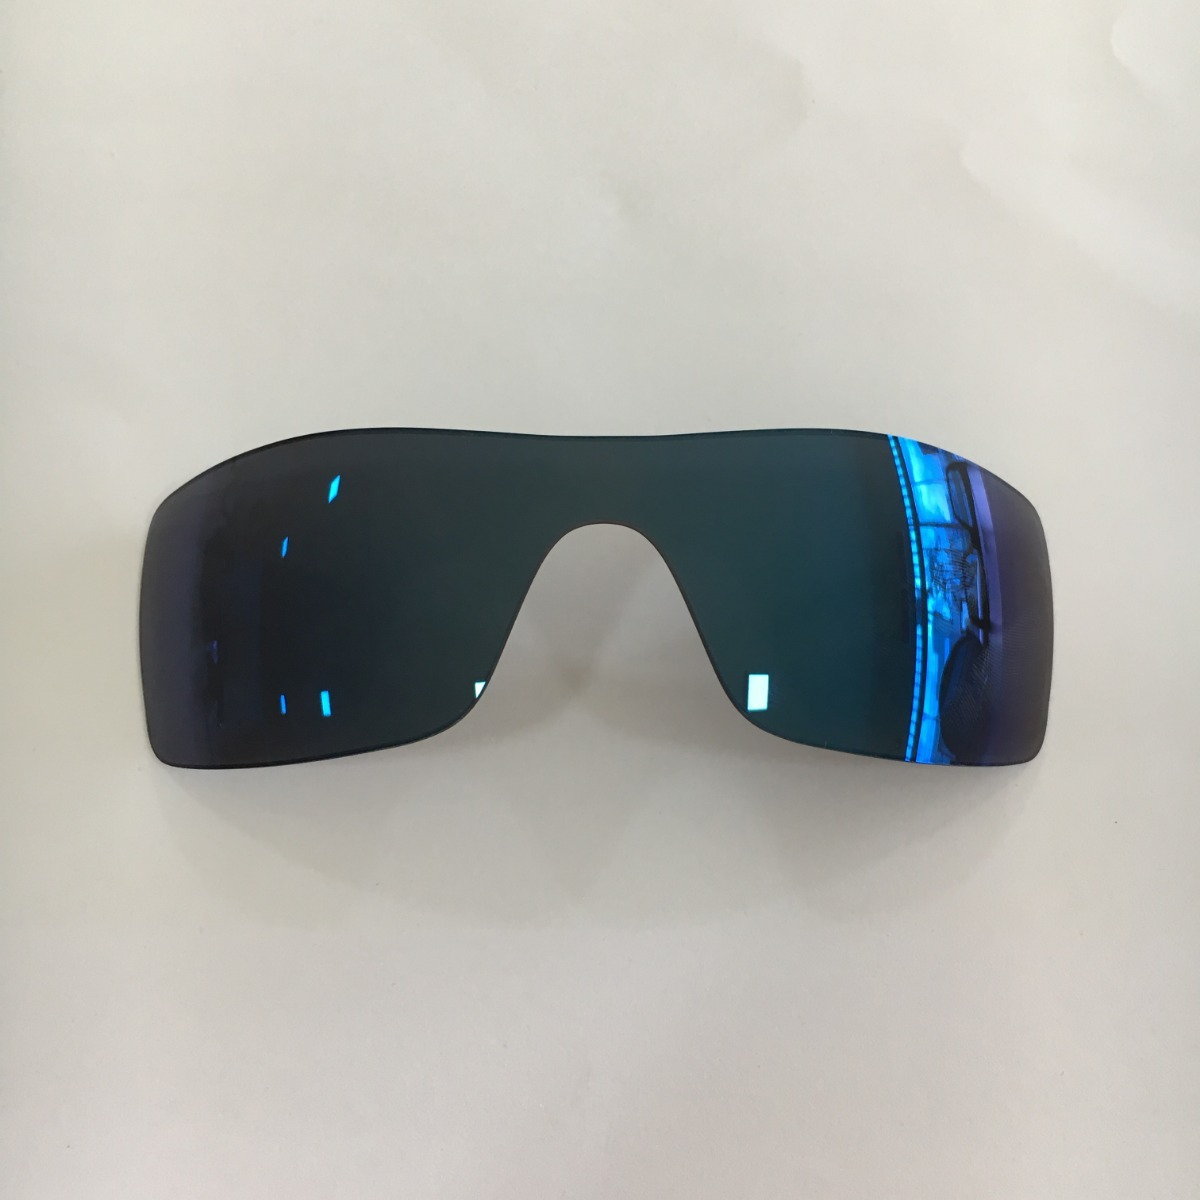 ab91245dc0929 lentes óculos oakley batwolf oo9101 ice iridium - original. Carregando zoom.